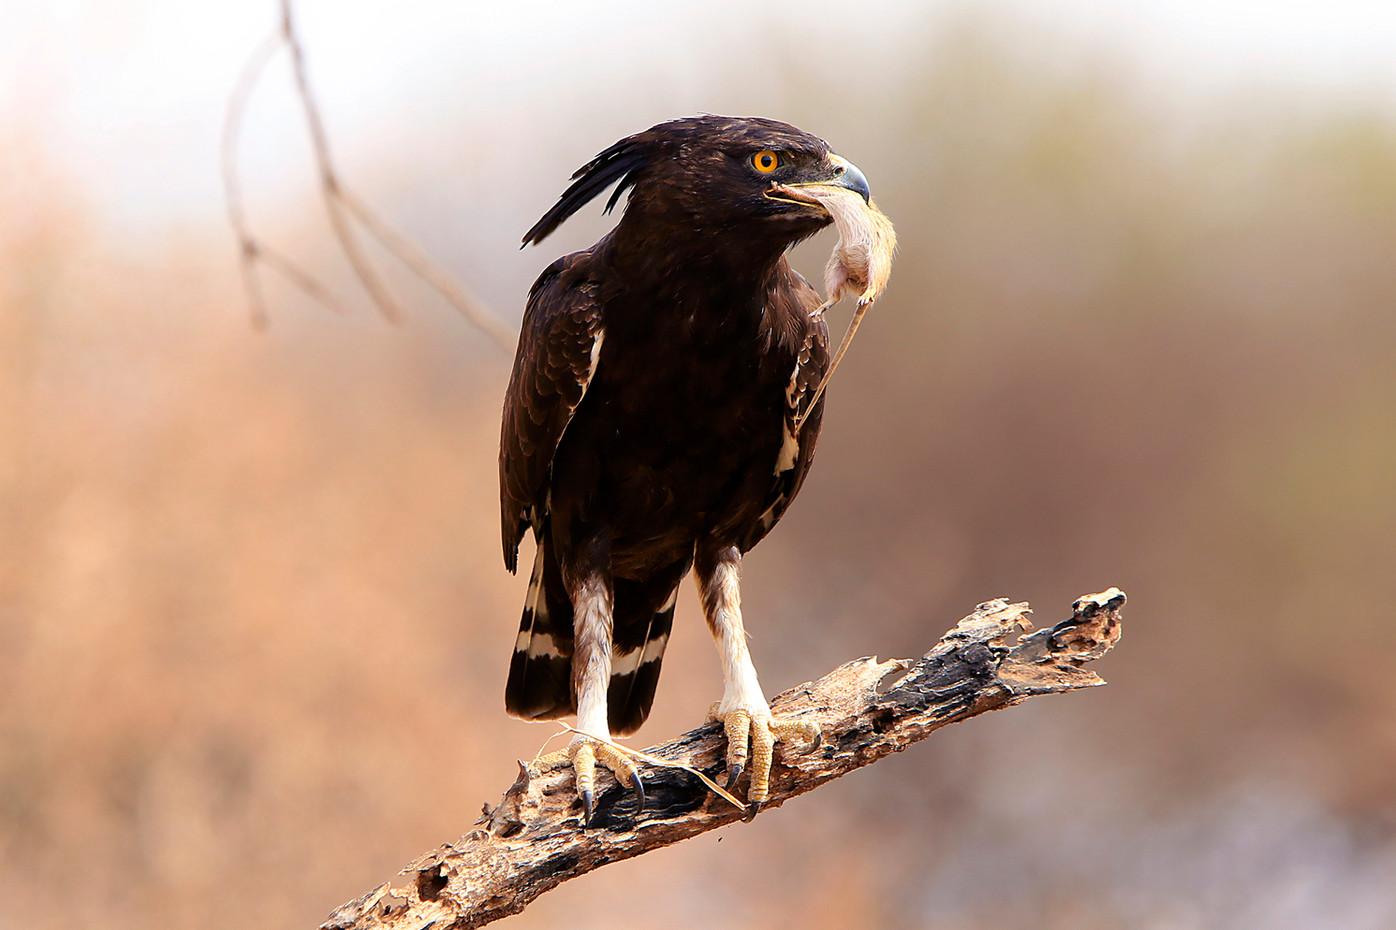 Long-crested Eagle and mouse in Tarangire NP, Tanzania